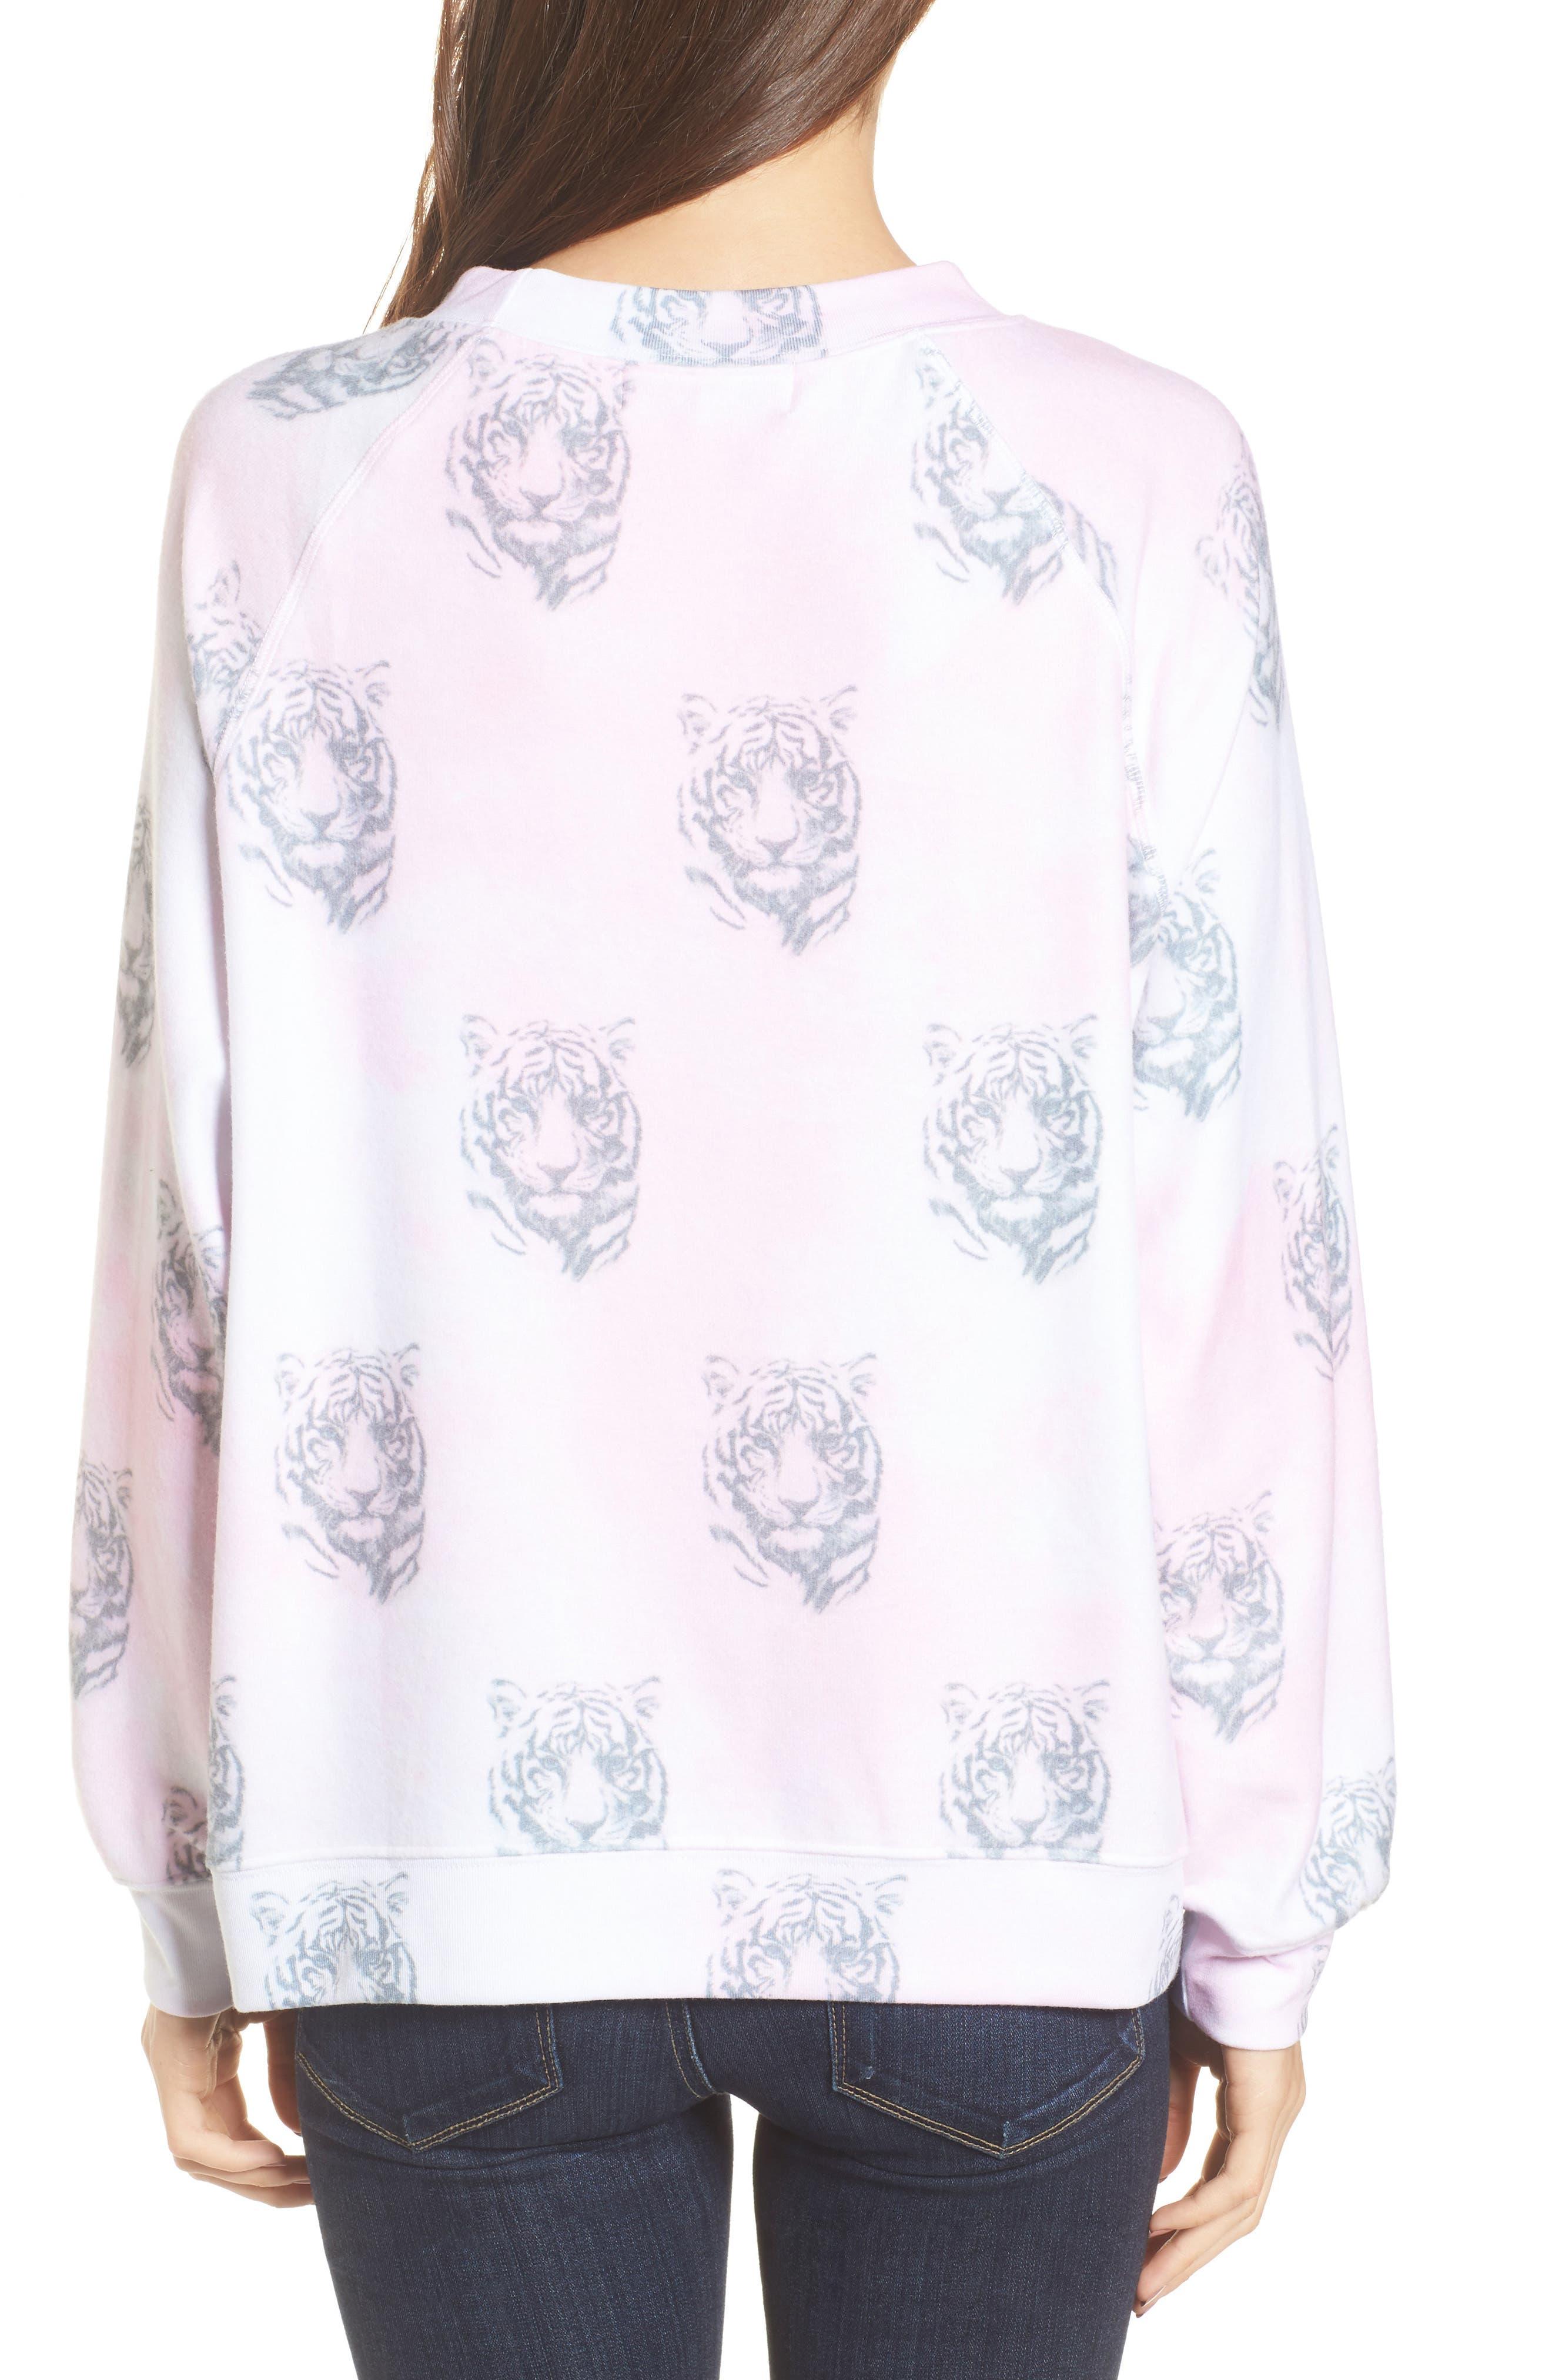 Bengals - Sommers Sweatshirt,                             Alternate thumbnail 2, color,                             Pink Flush